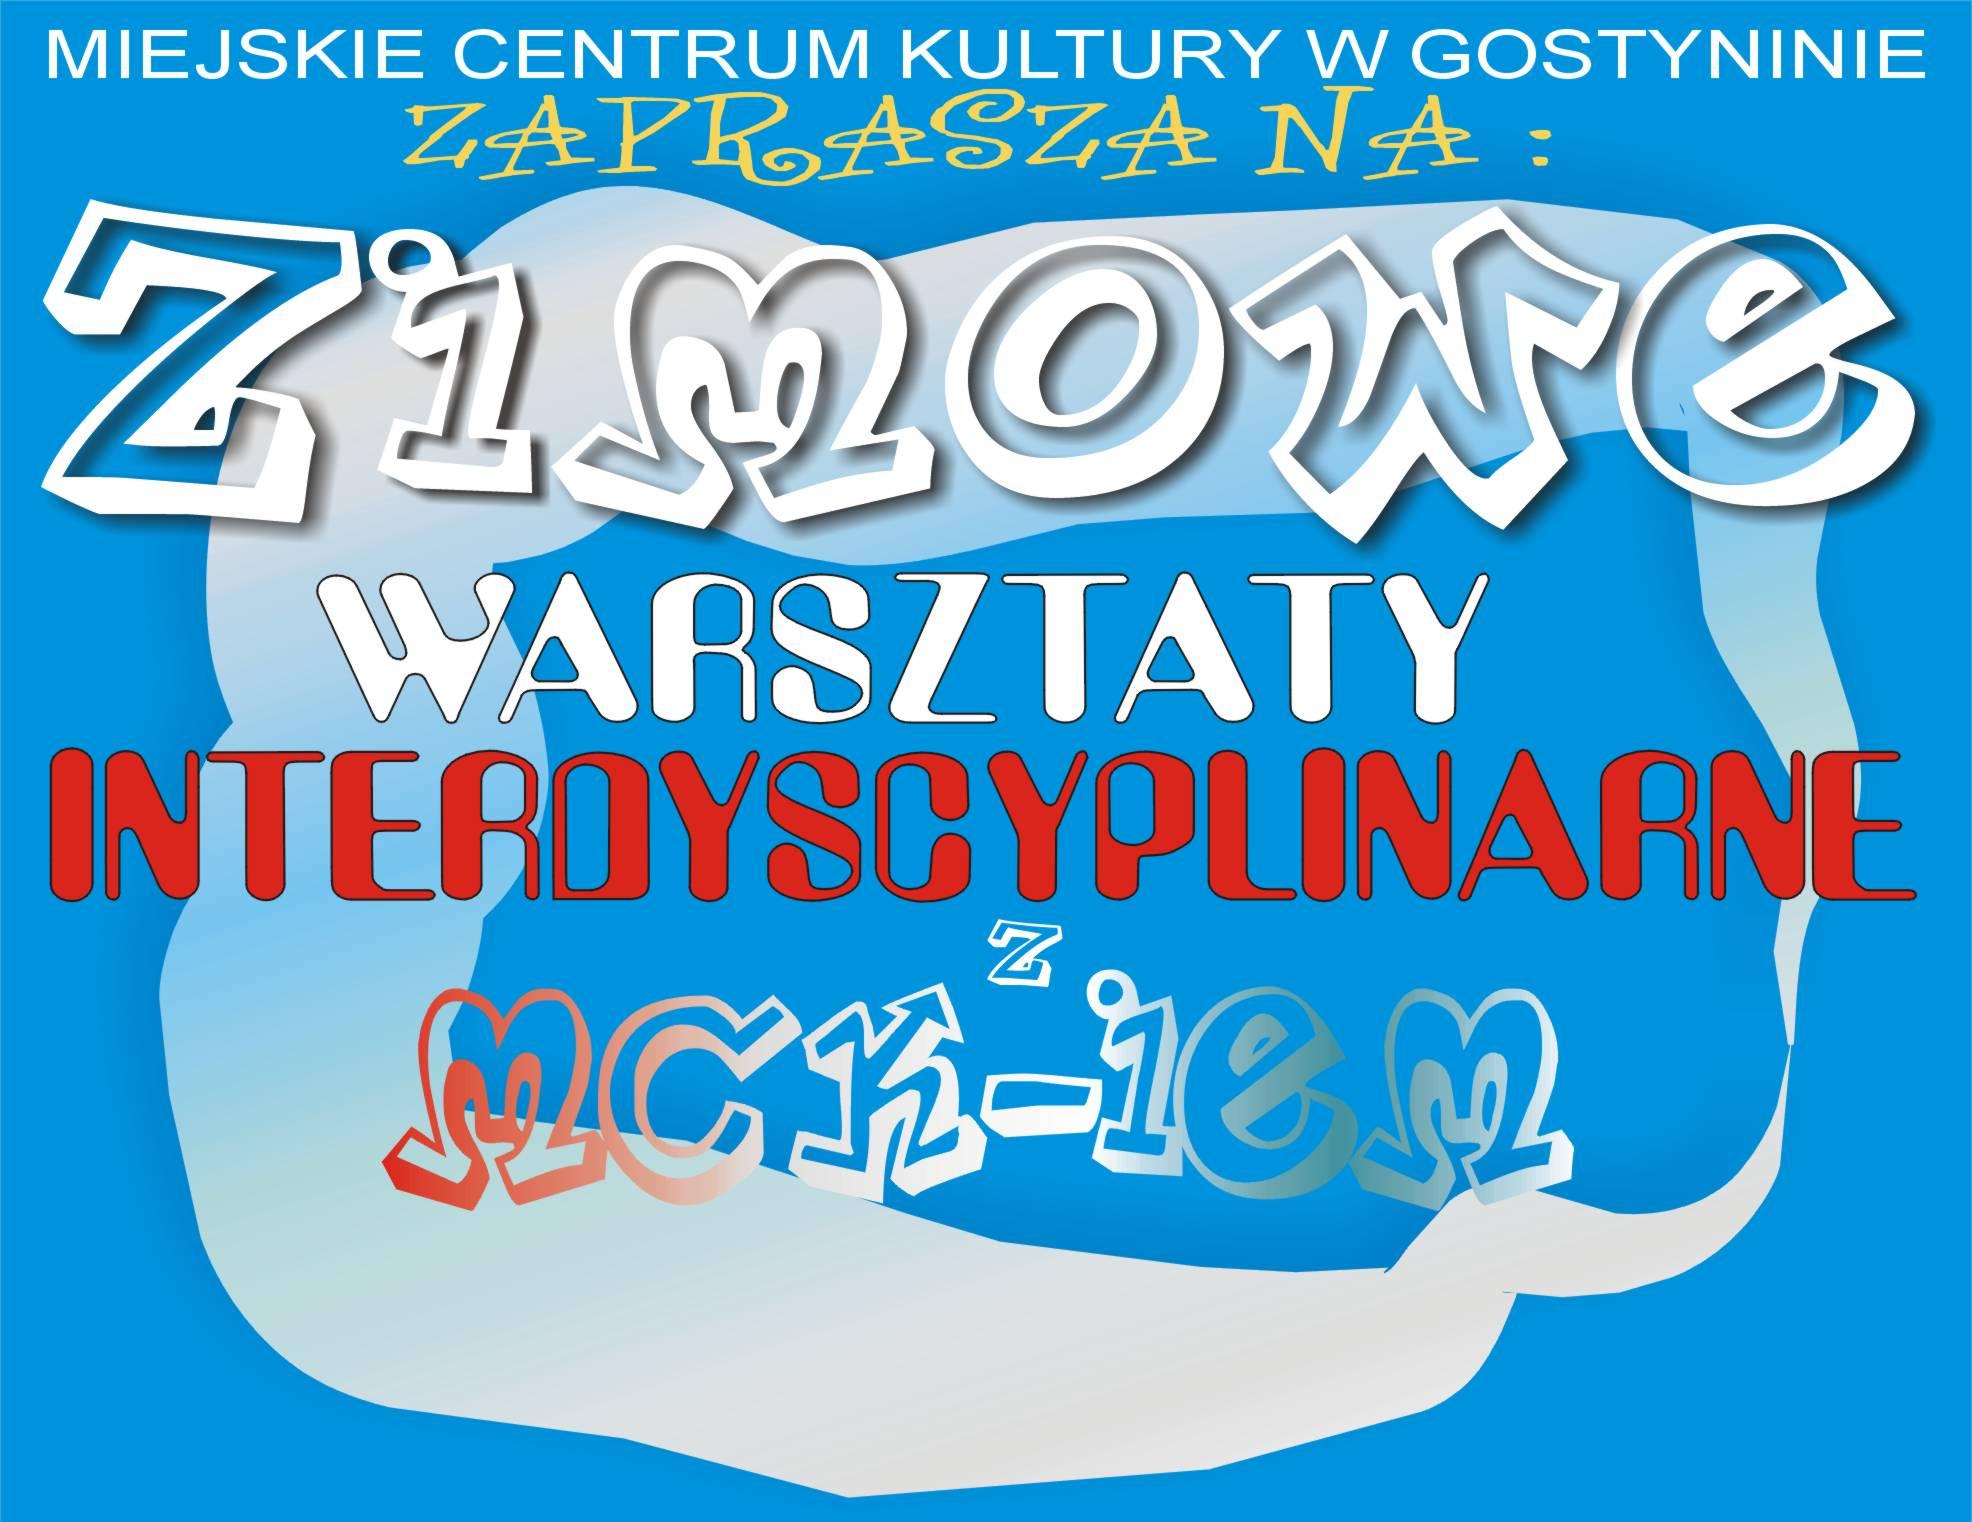 ZIMOWE WARSZTATY INTERDYSCYPLINARNE